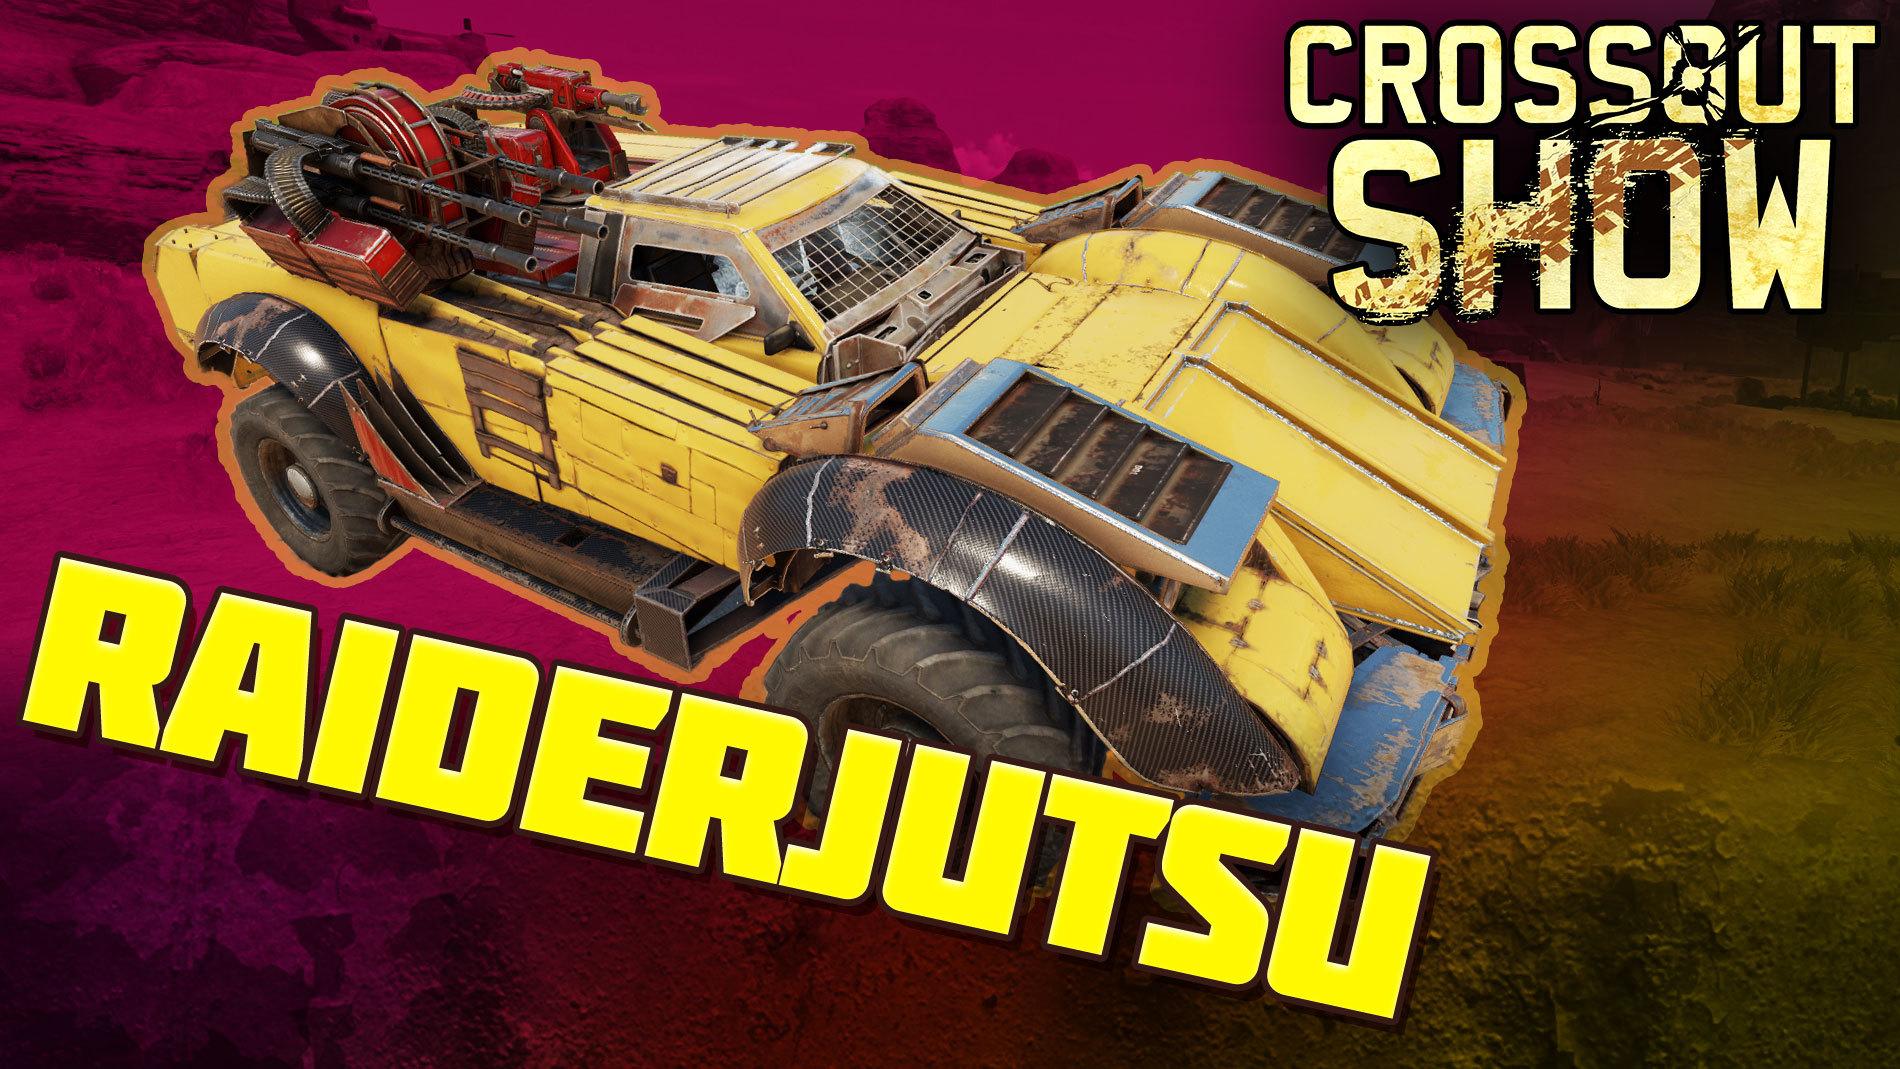 [Video] Crossout Show: Raiderjutsu